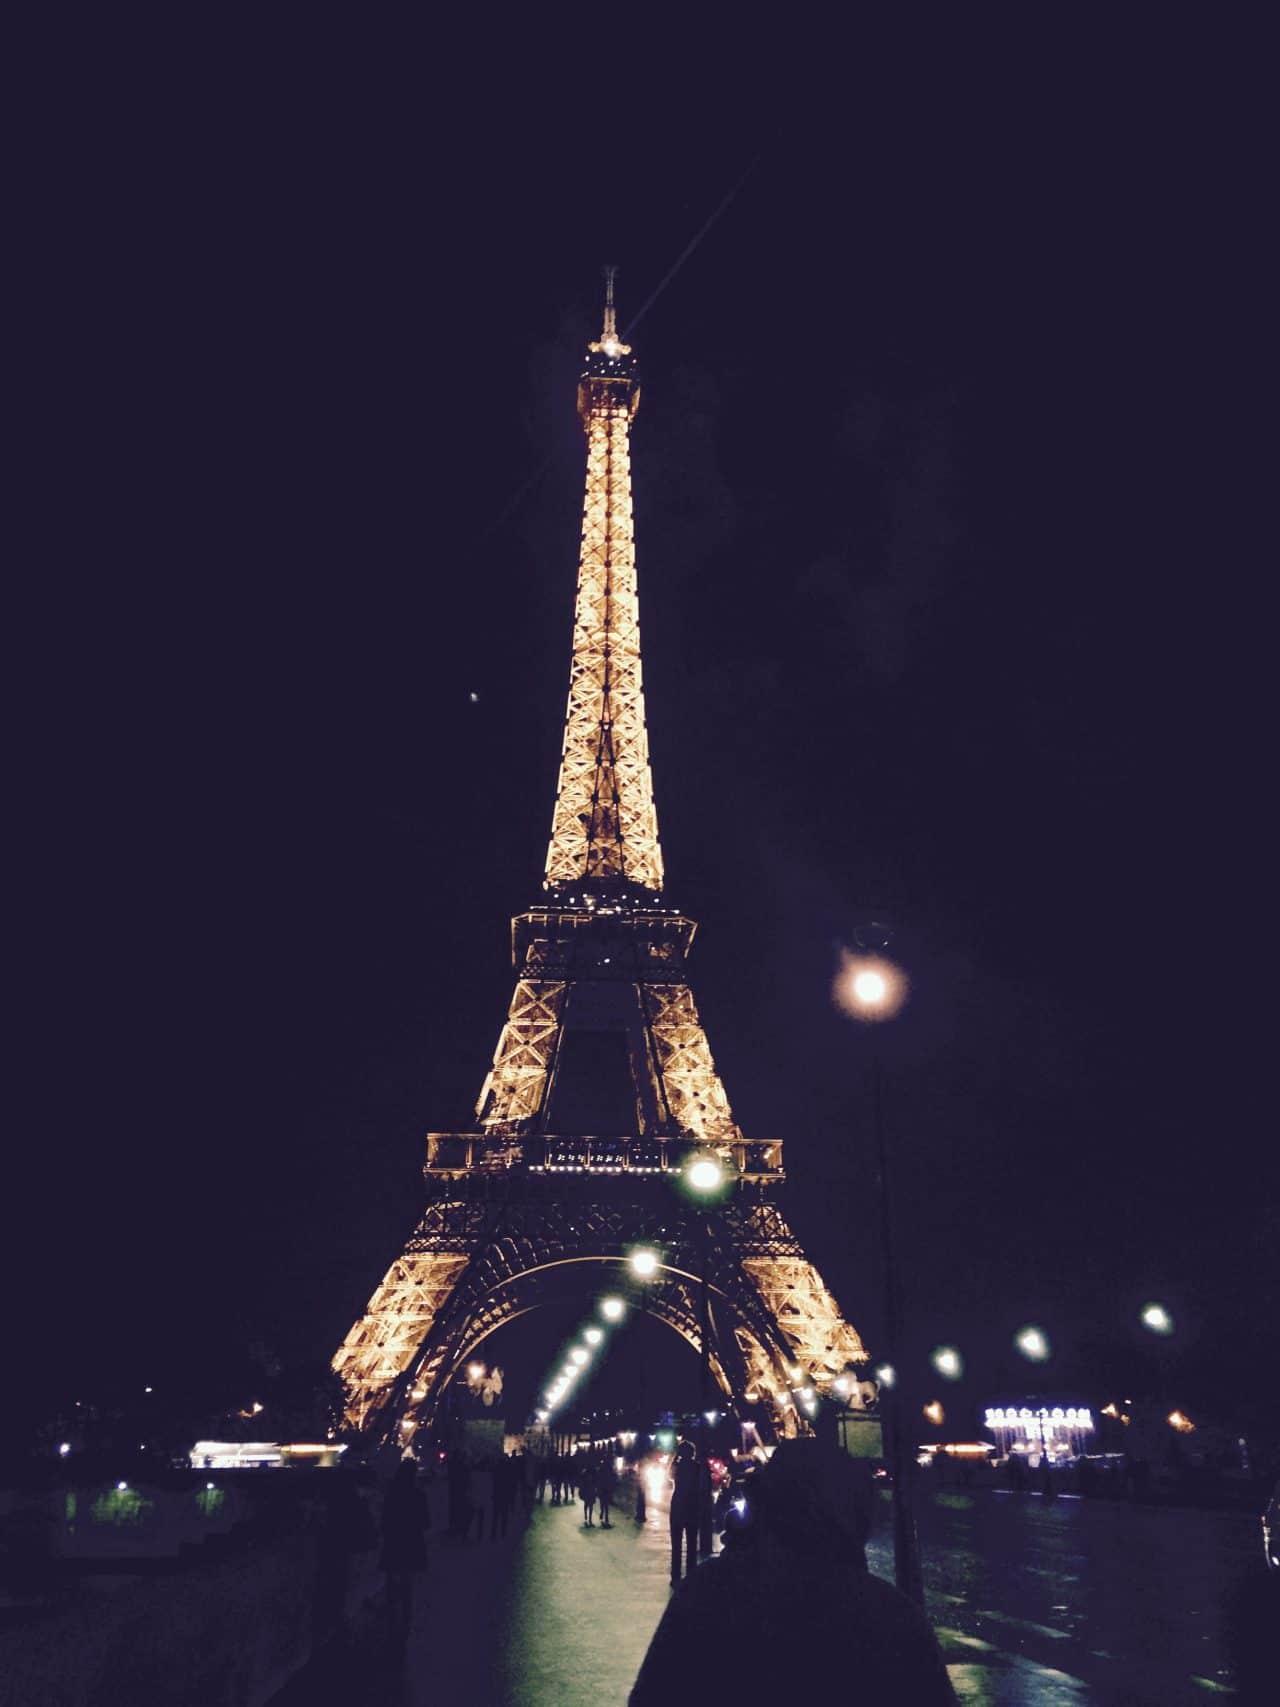 Eiffel Tower, Paris at Nighttime